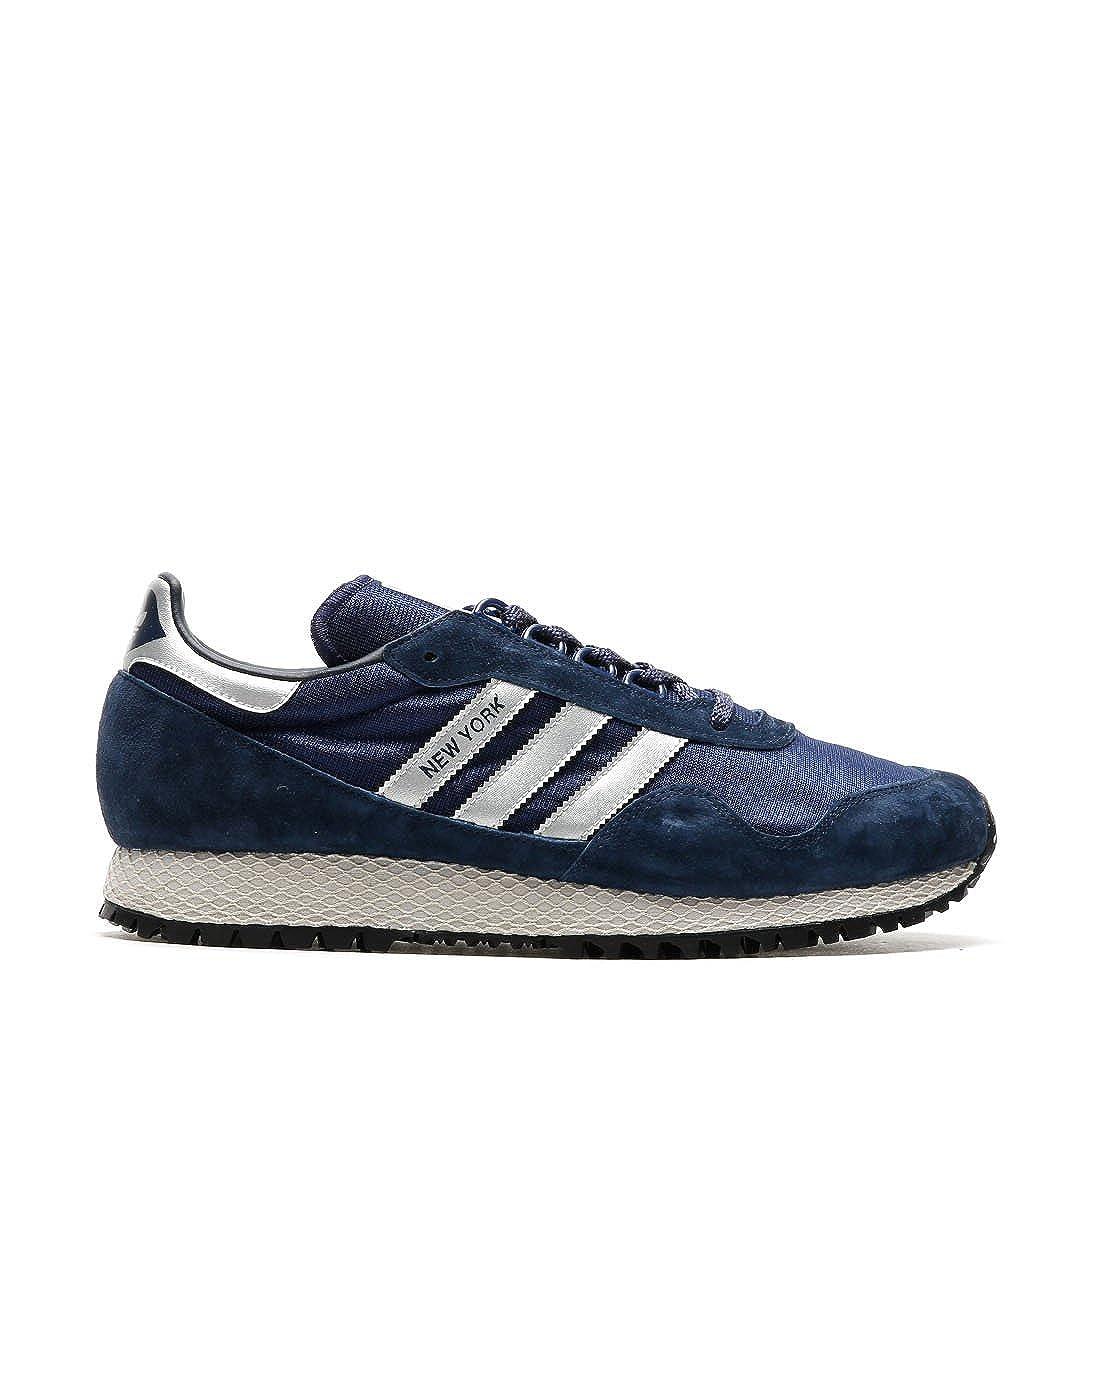 adidas Originals New York BB1188 Dark Blue Matte Silver Collegiate Navy (UK  11 EUR 46)  Amazon.co.uk  Clothing dfb83cd5c